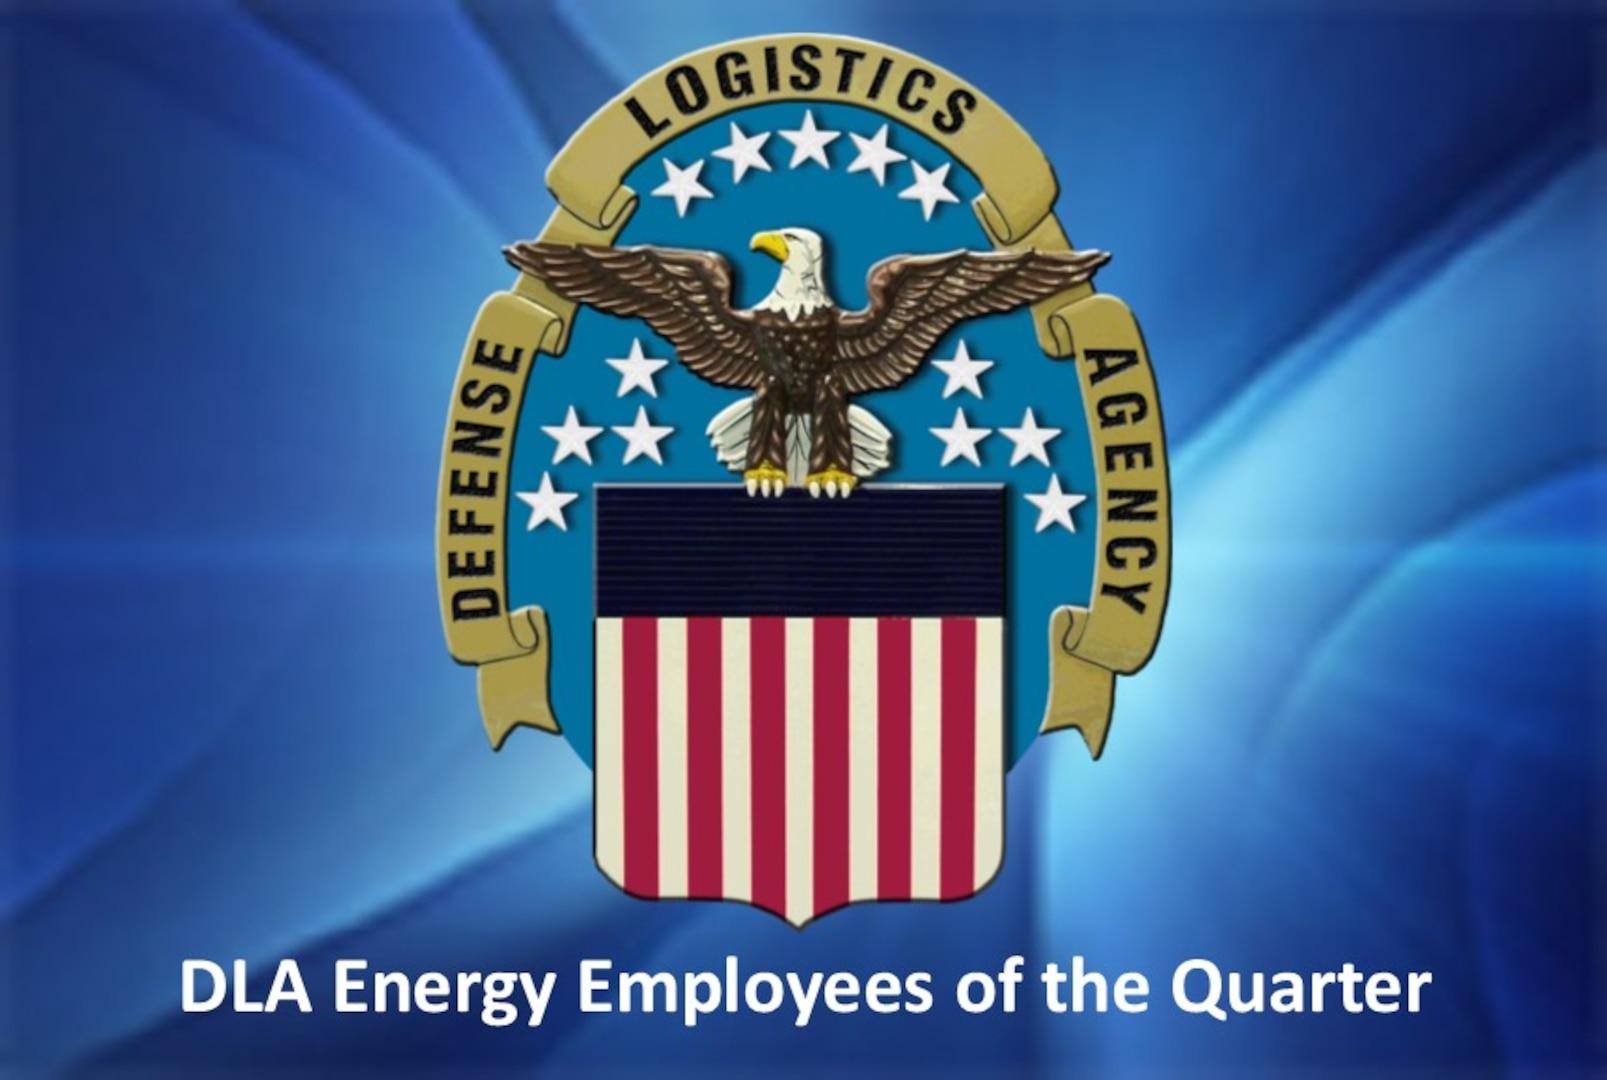 graphic with DLA logo